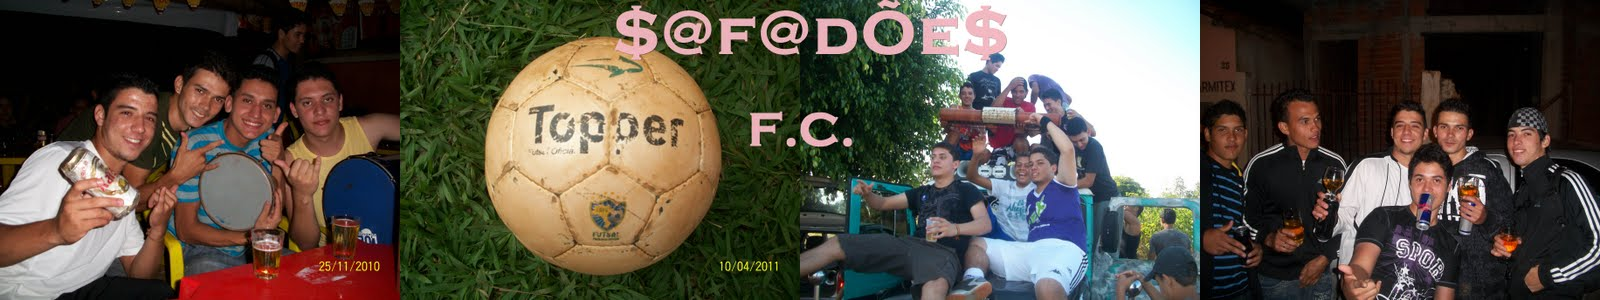 Safadões F.C